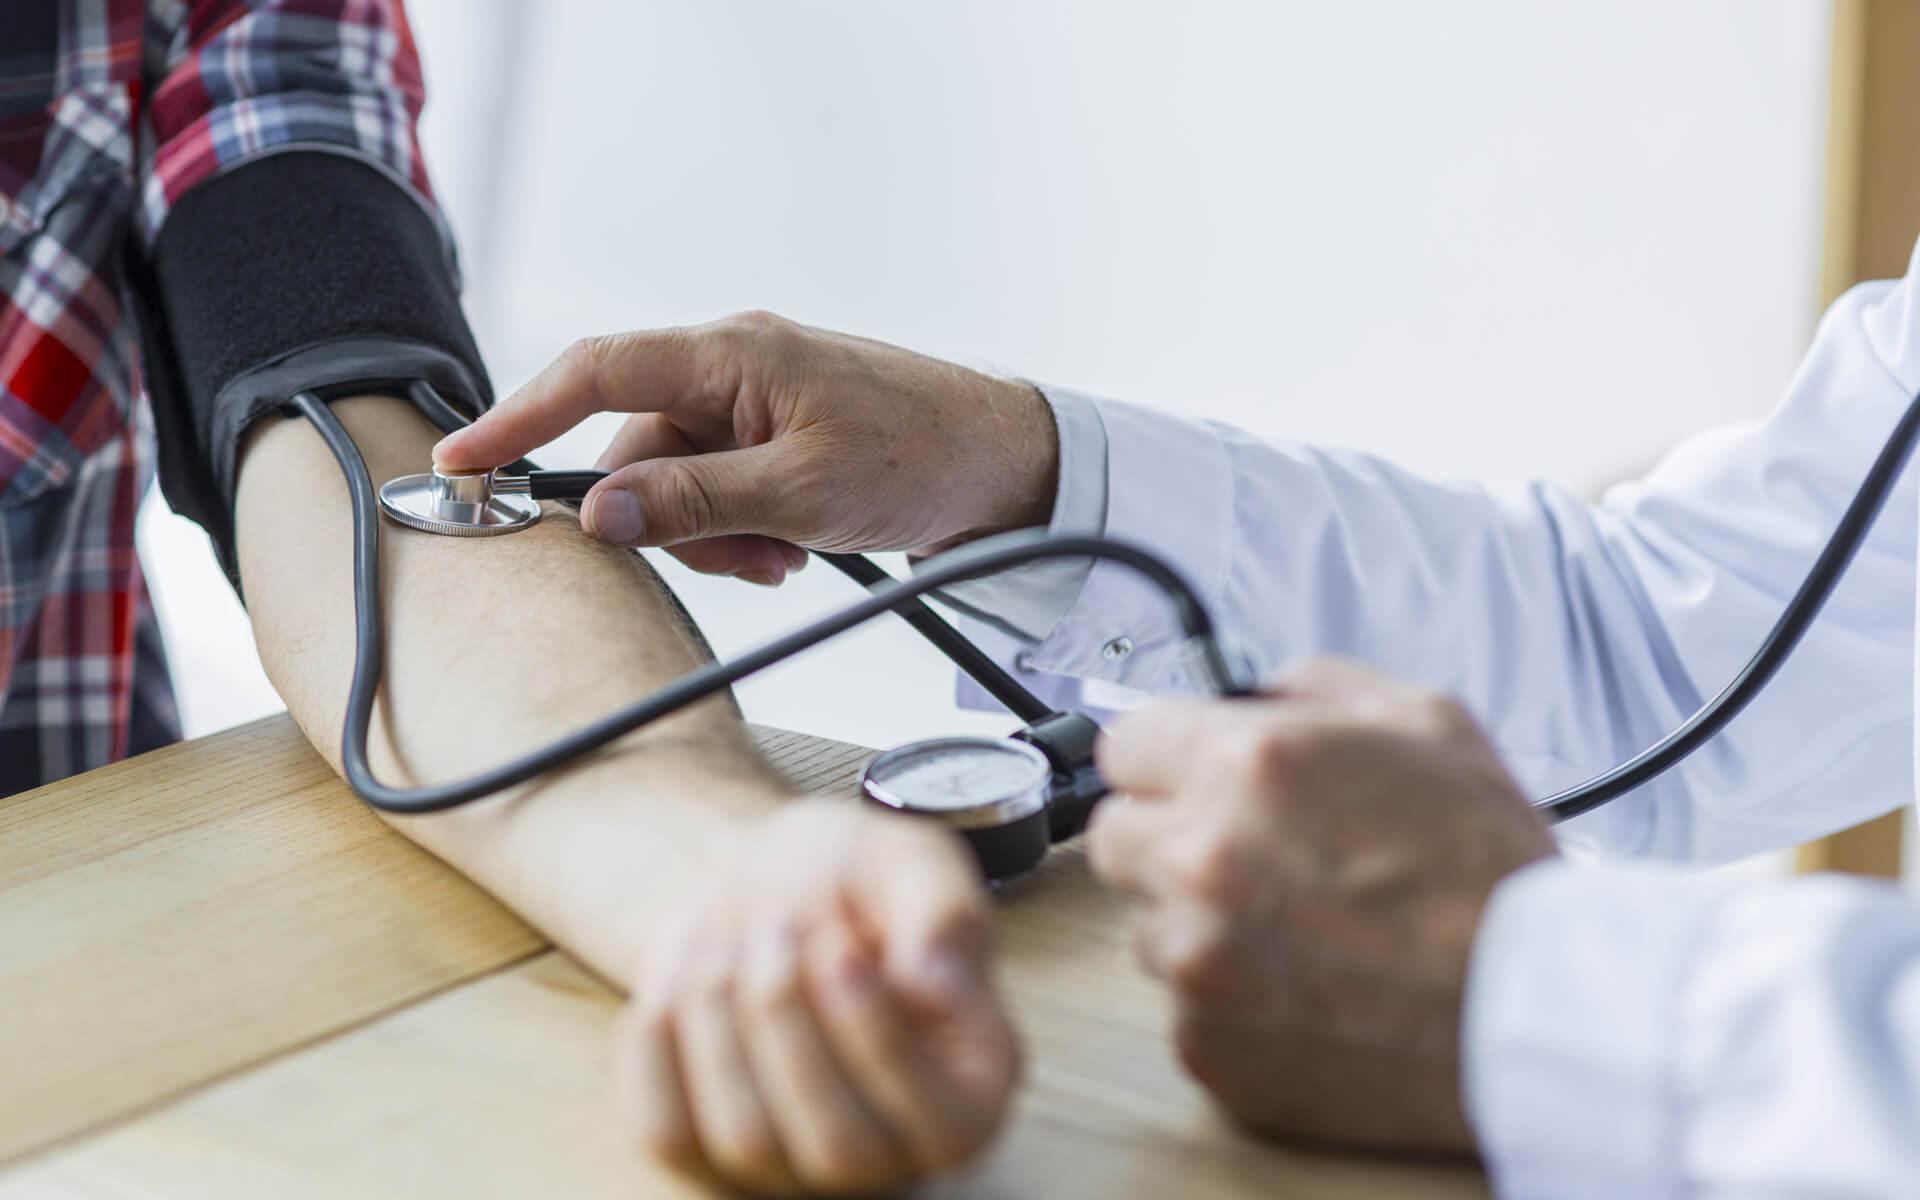 Dr Goudot Prothèse de genou